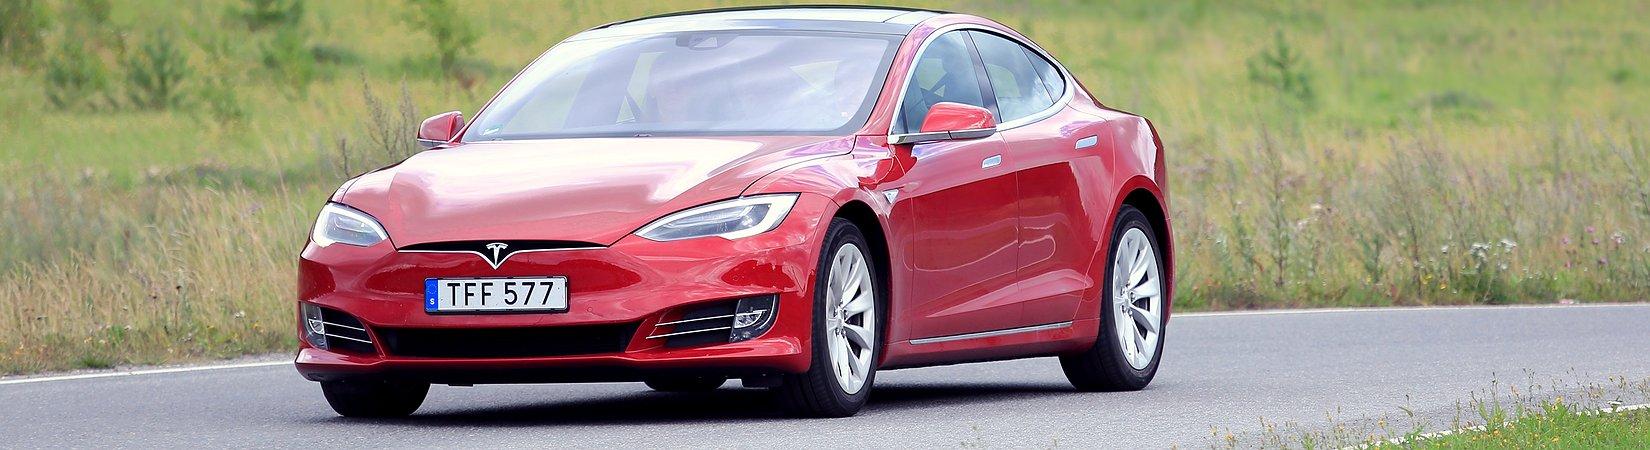 Vídeo: Tesla superou Porsche em corrida